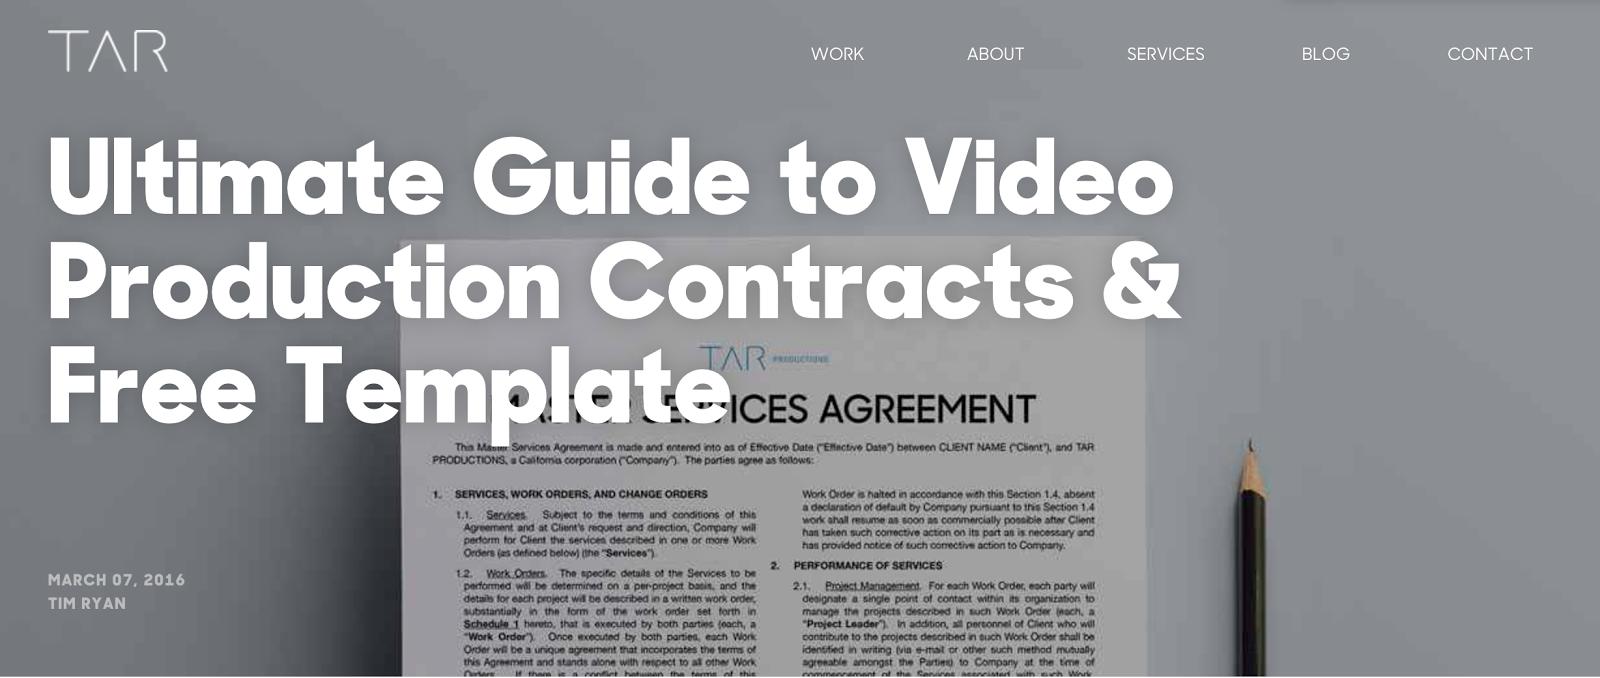 tarproductions videocontracts